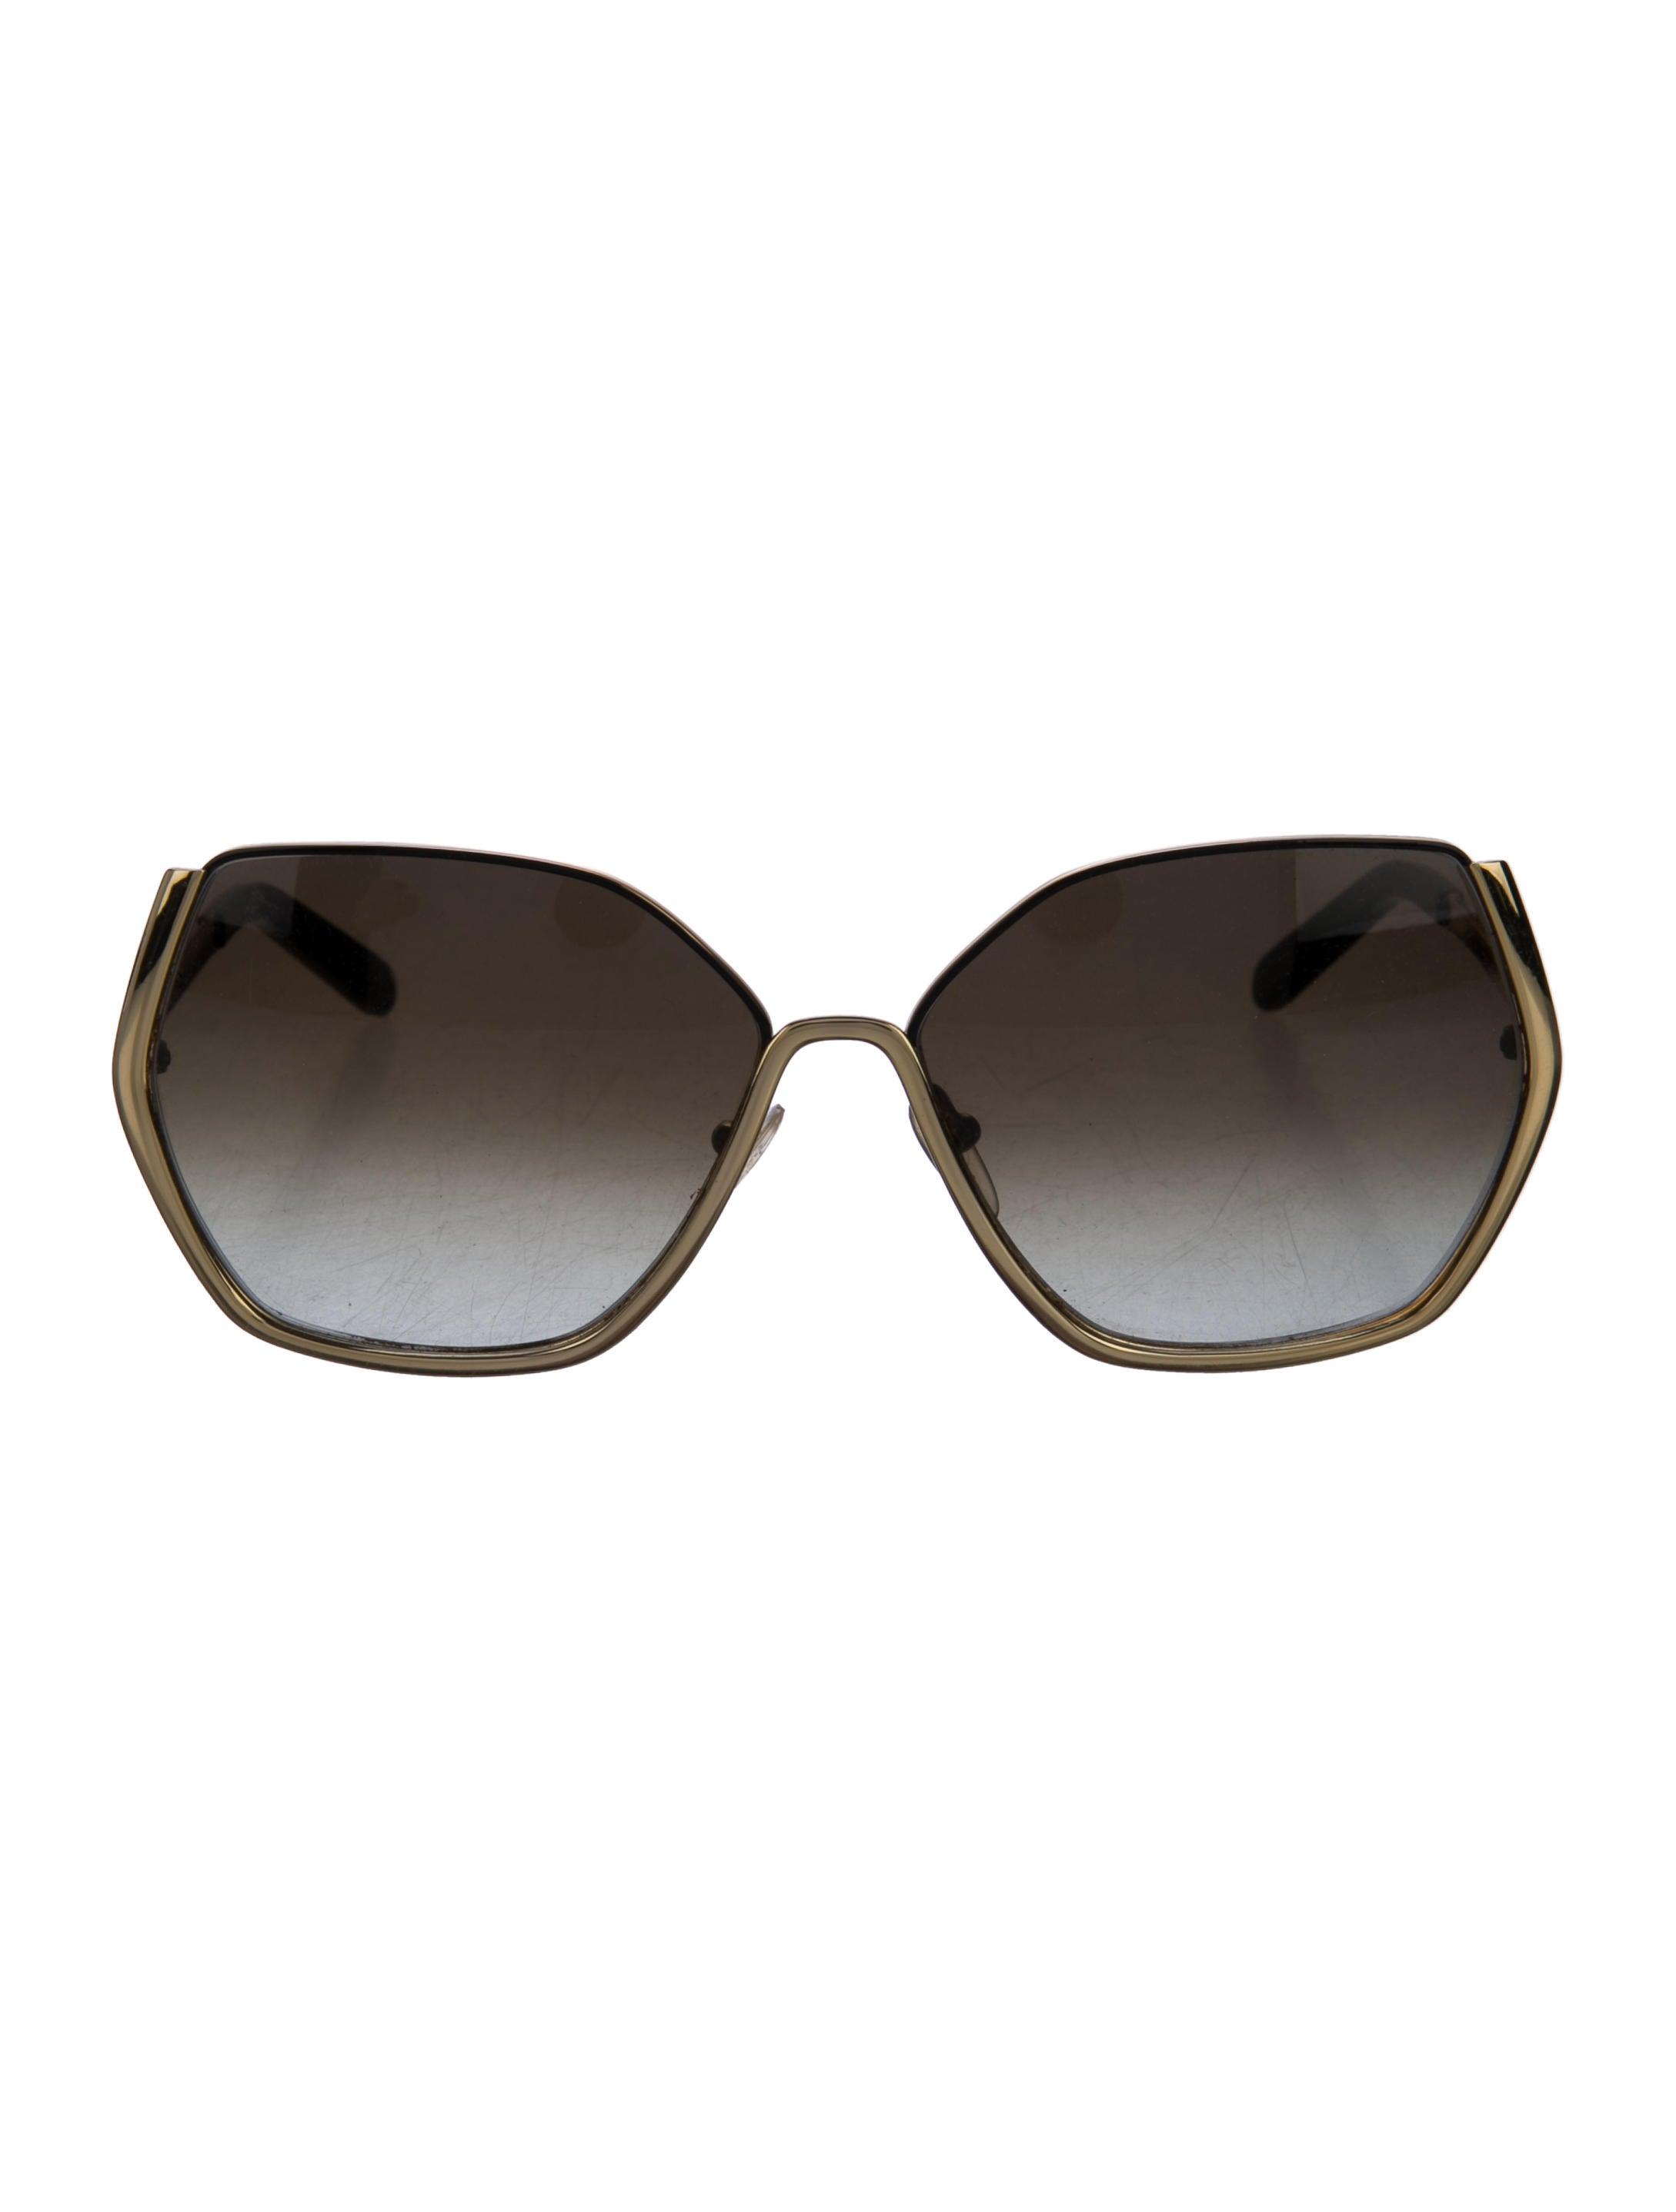 6125ca500a0a Chloe Sunglasses 2017 Prices